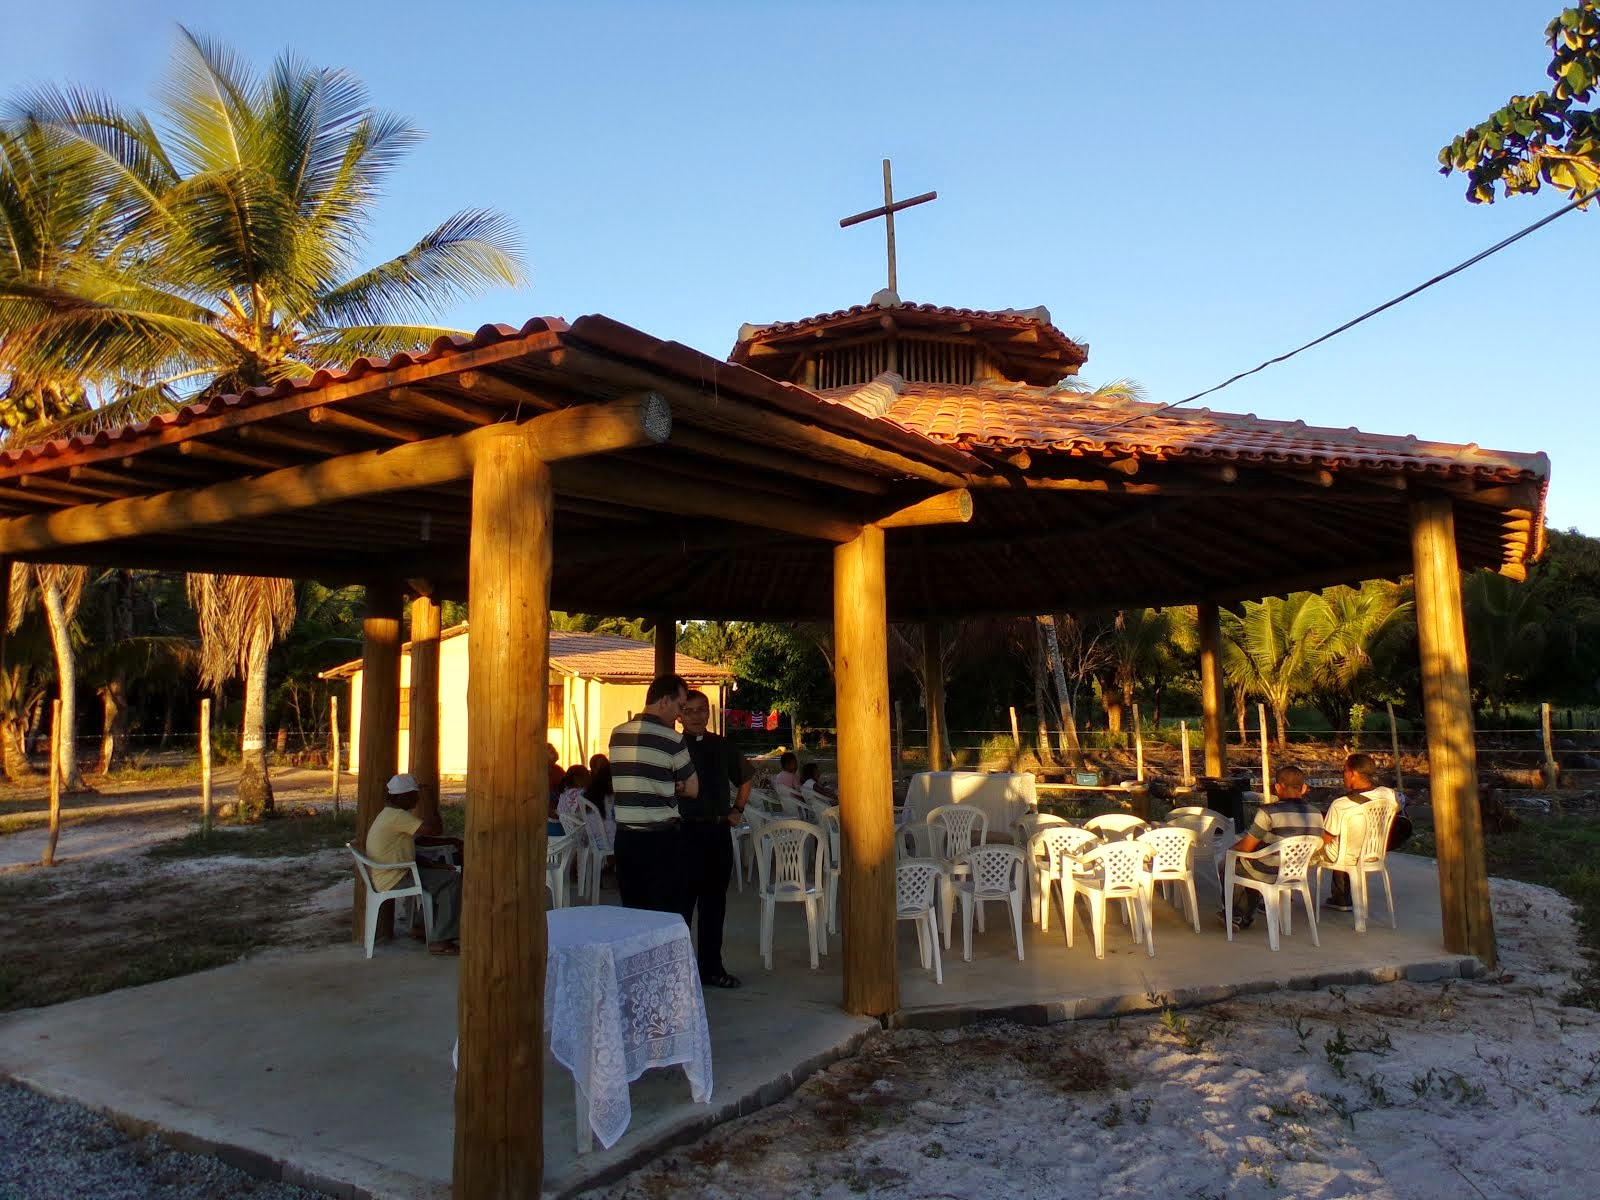 Igreja N. Sra. de Guadalupe